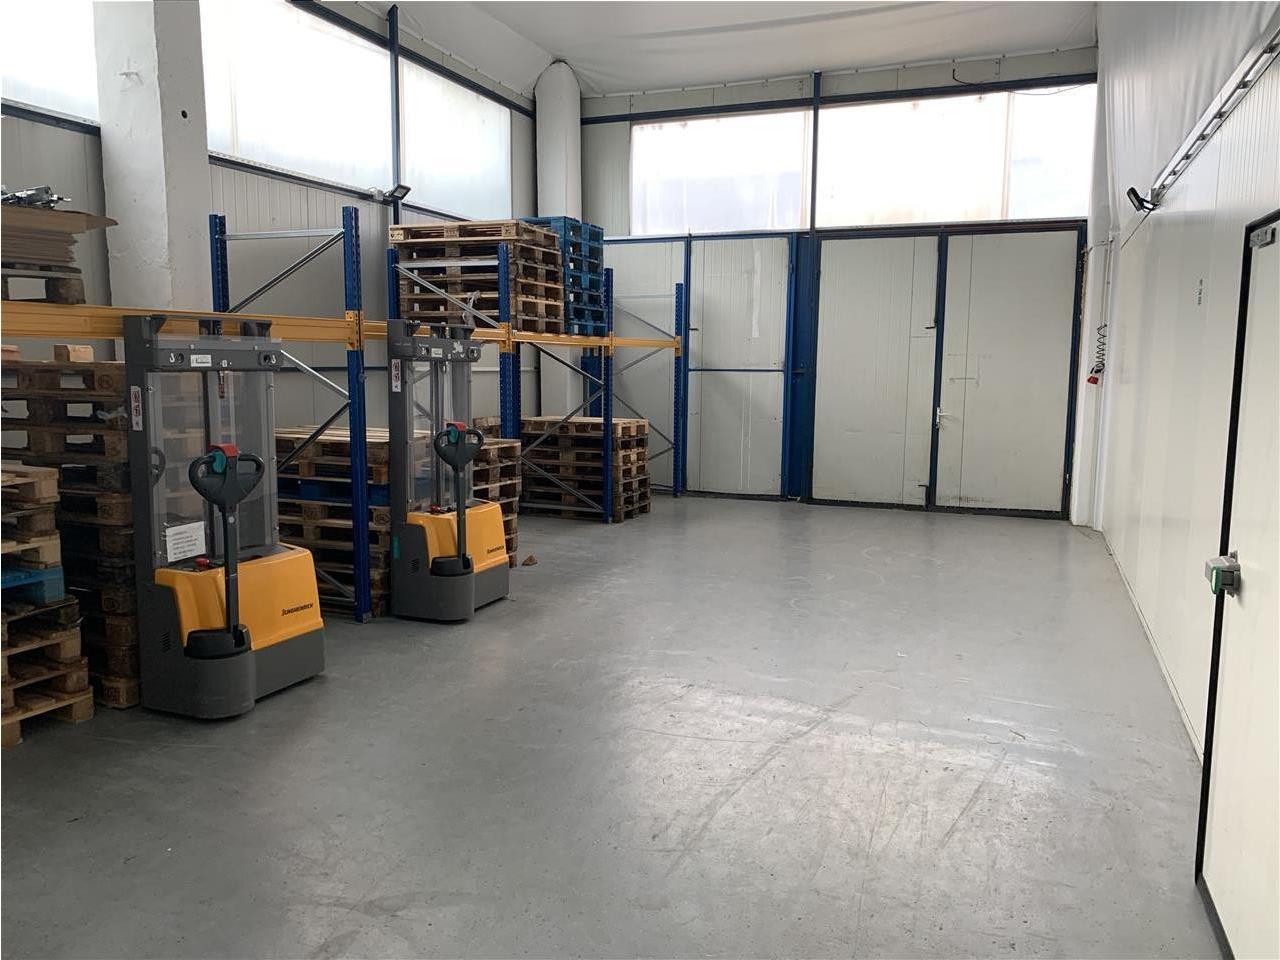 Inchiriere spatiu de depozitare sau industrial zona Ambient Someseni, Cluj Napoca